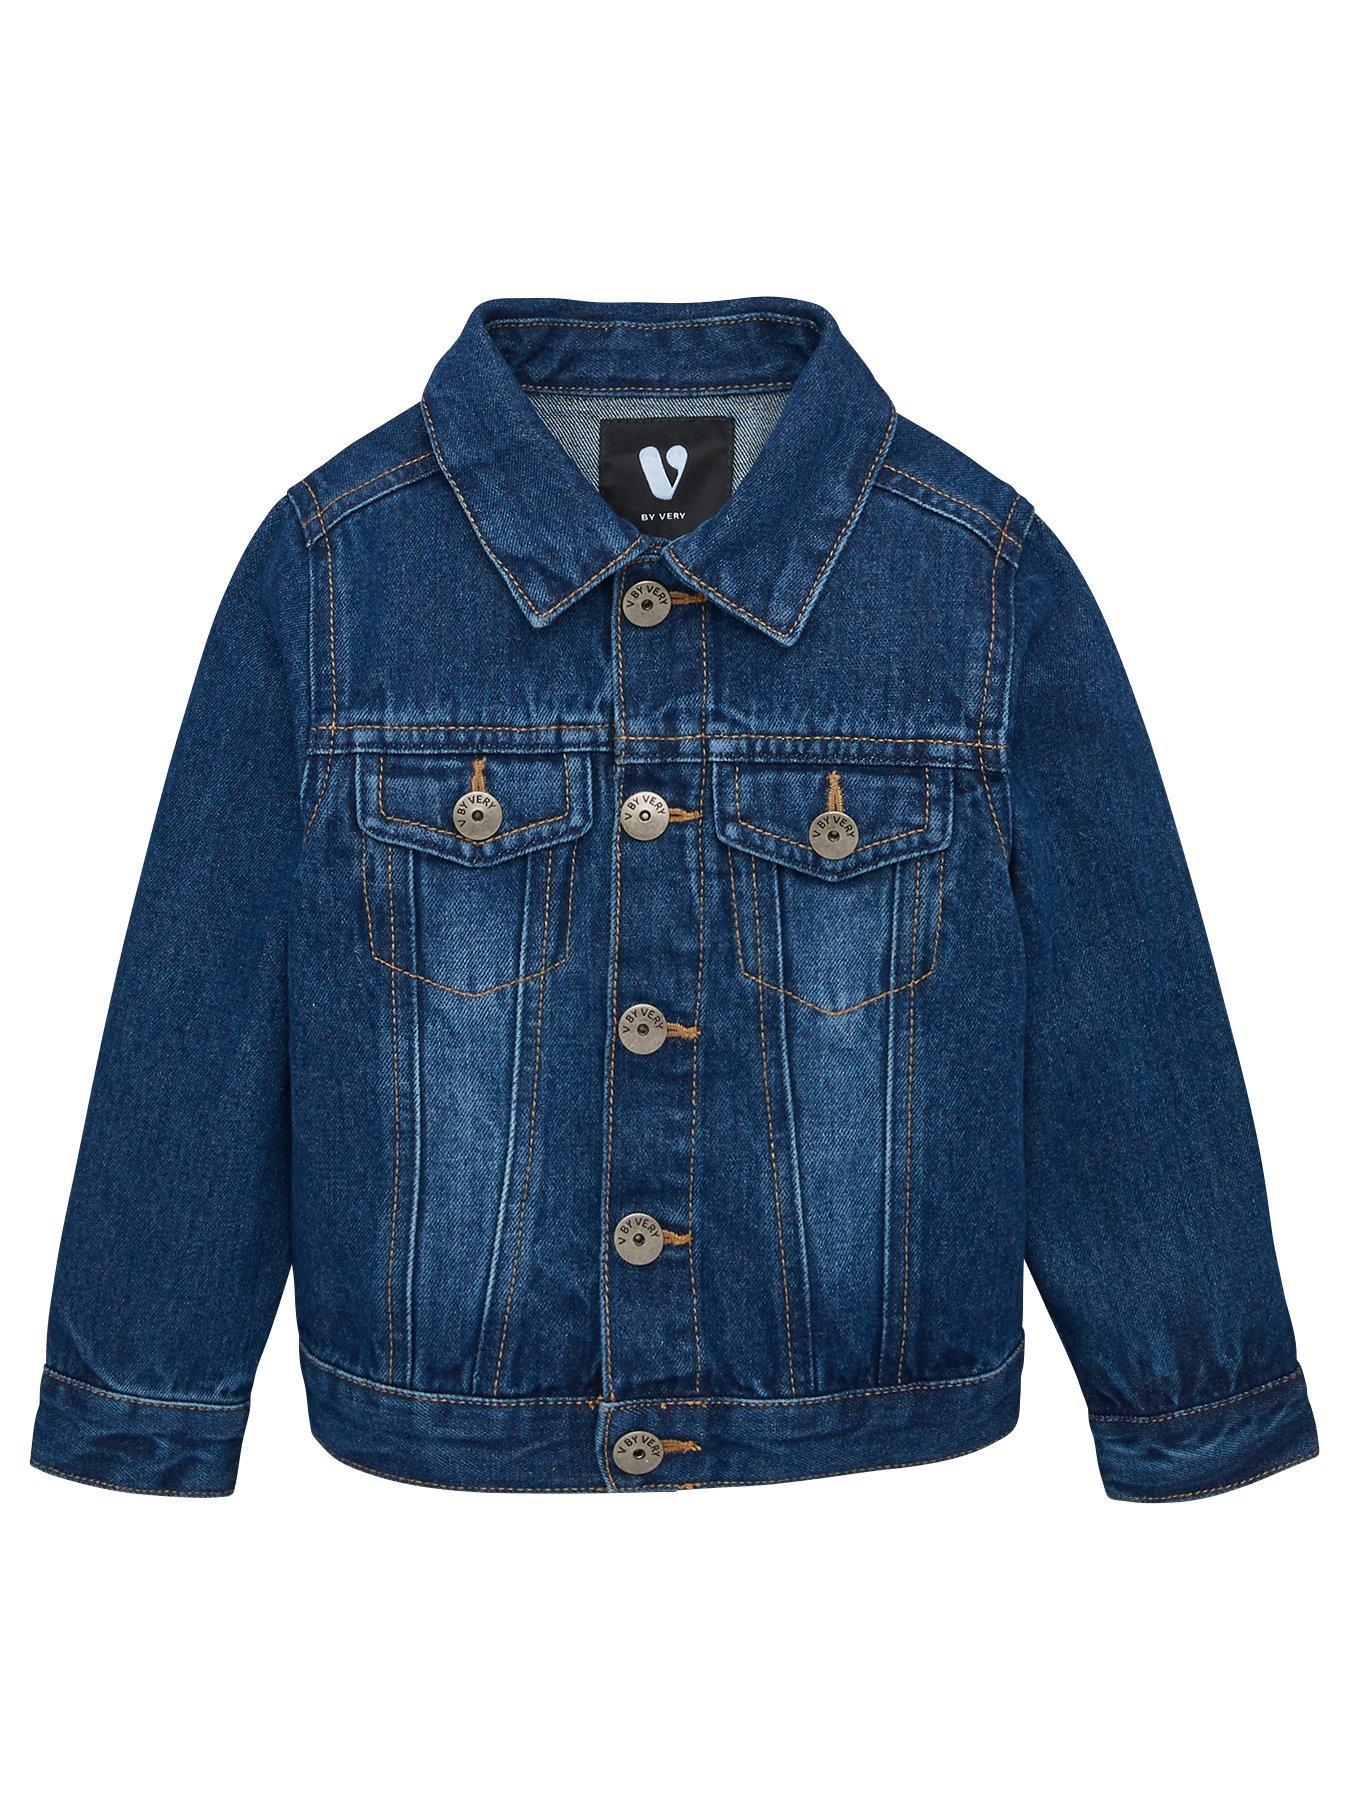 Girls Winter Coat Value School//Casual Hood//Hoodie Fleece Lined 1,2,3,4 or 5Years